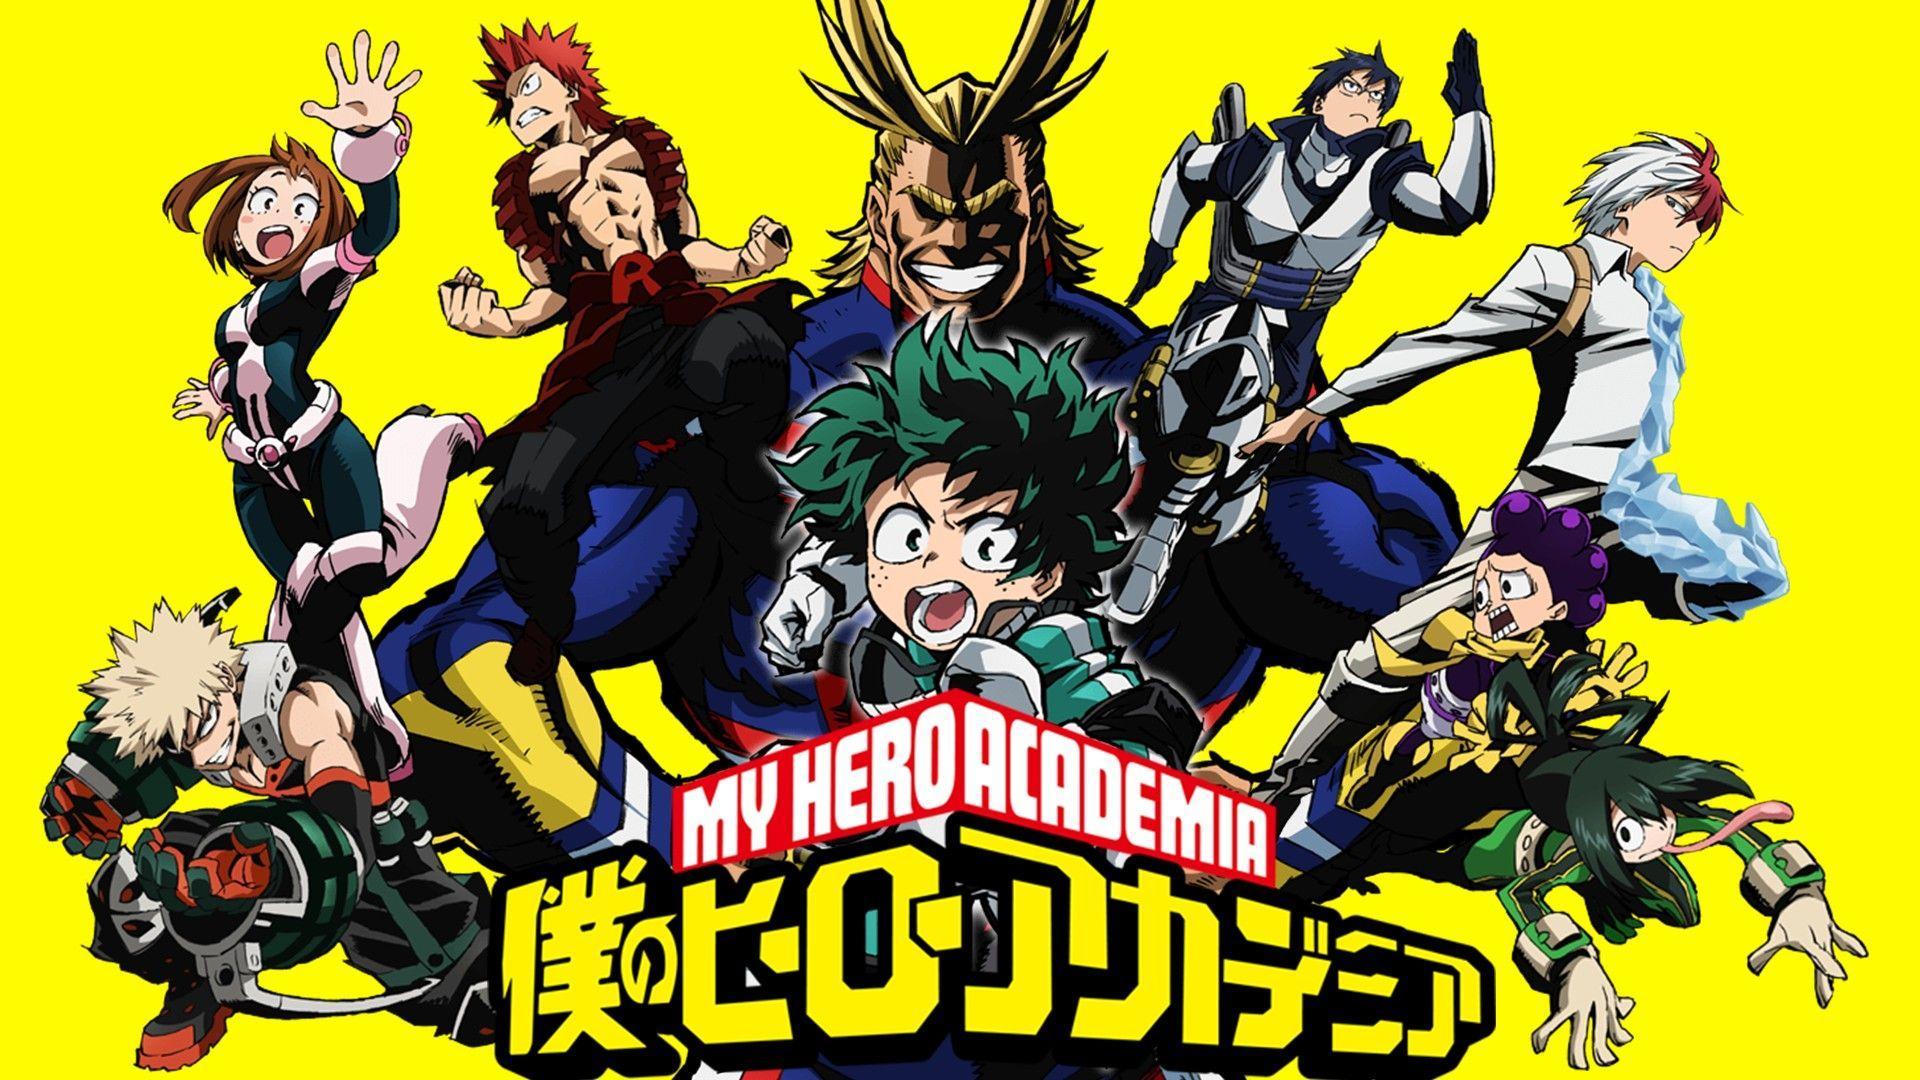 My Hero Academia 4k Wallpapers Top Free My Hero Academia 4k